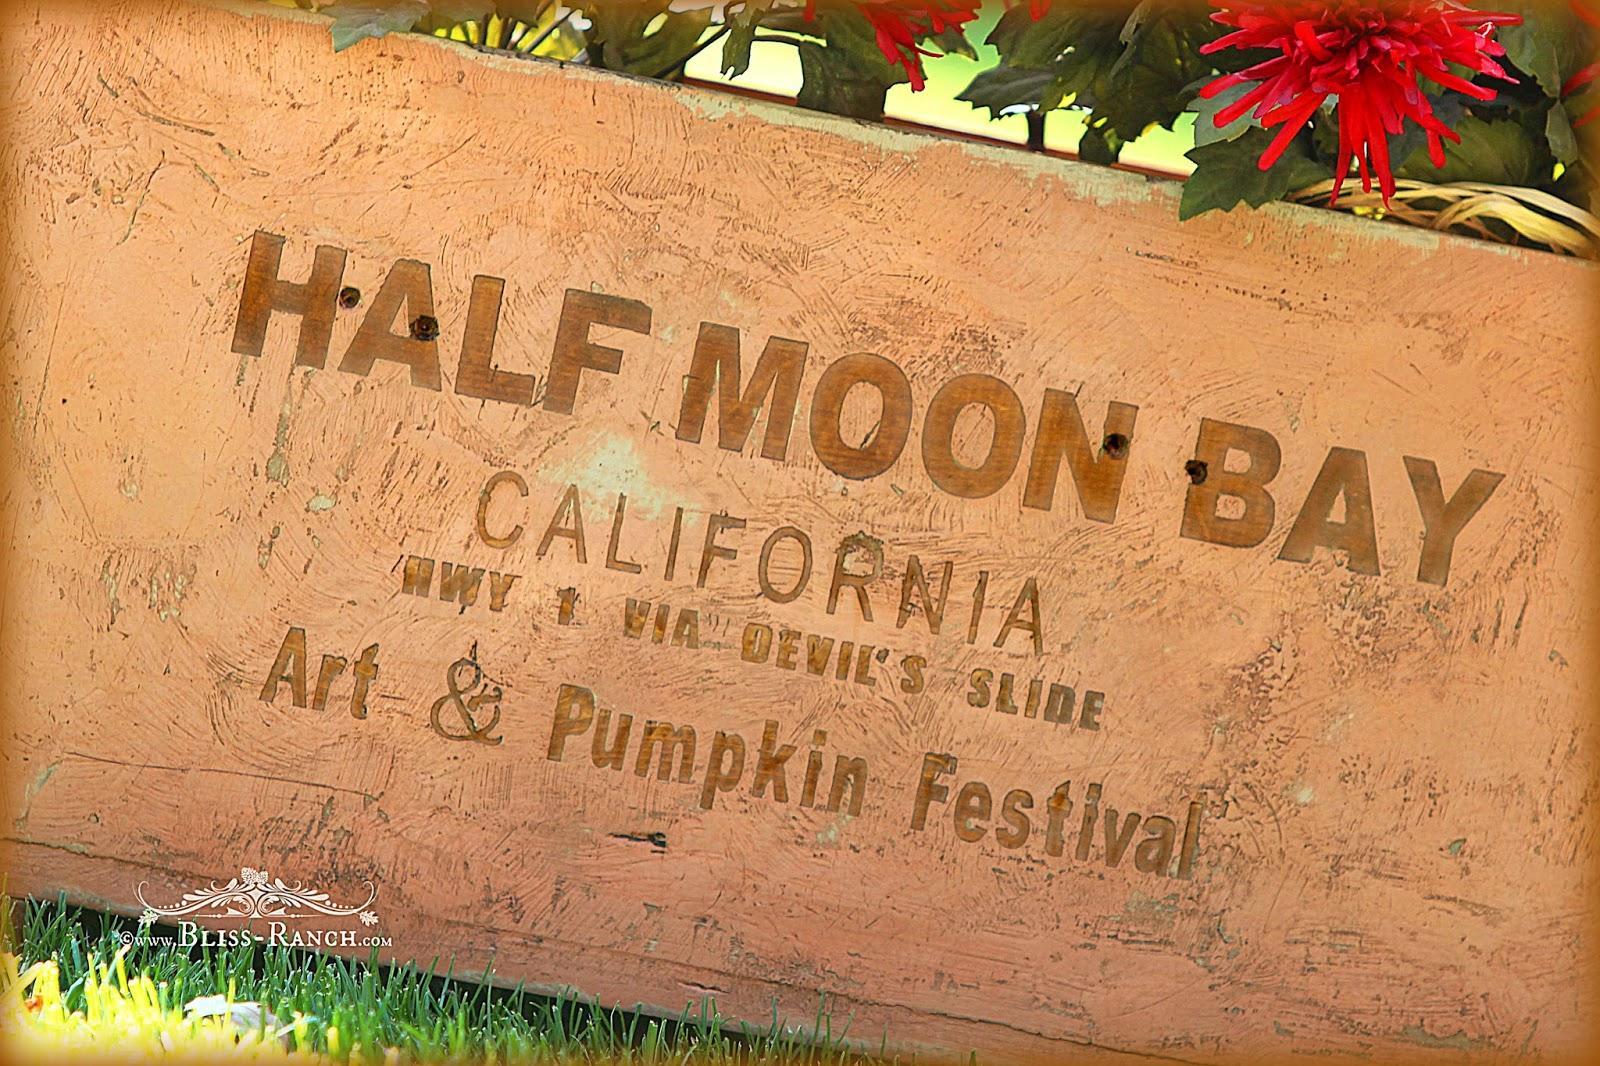 Half Moon Bay California Box Maison Blanche Paint Bliss-Ranch.com